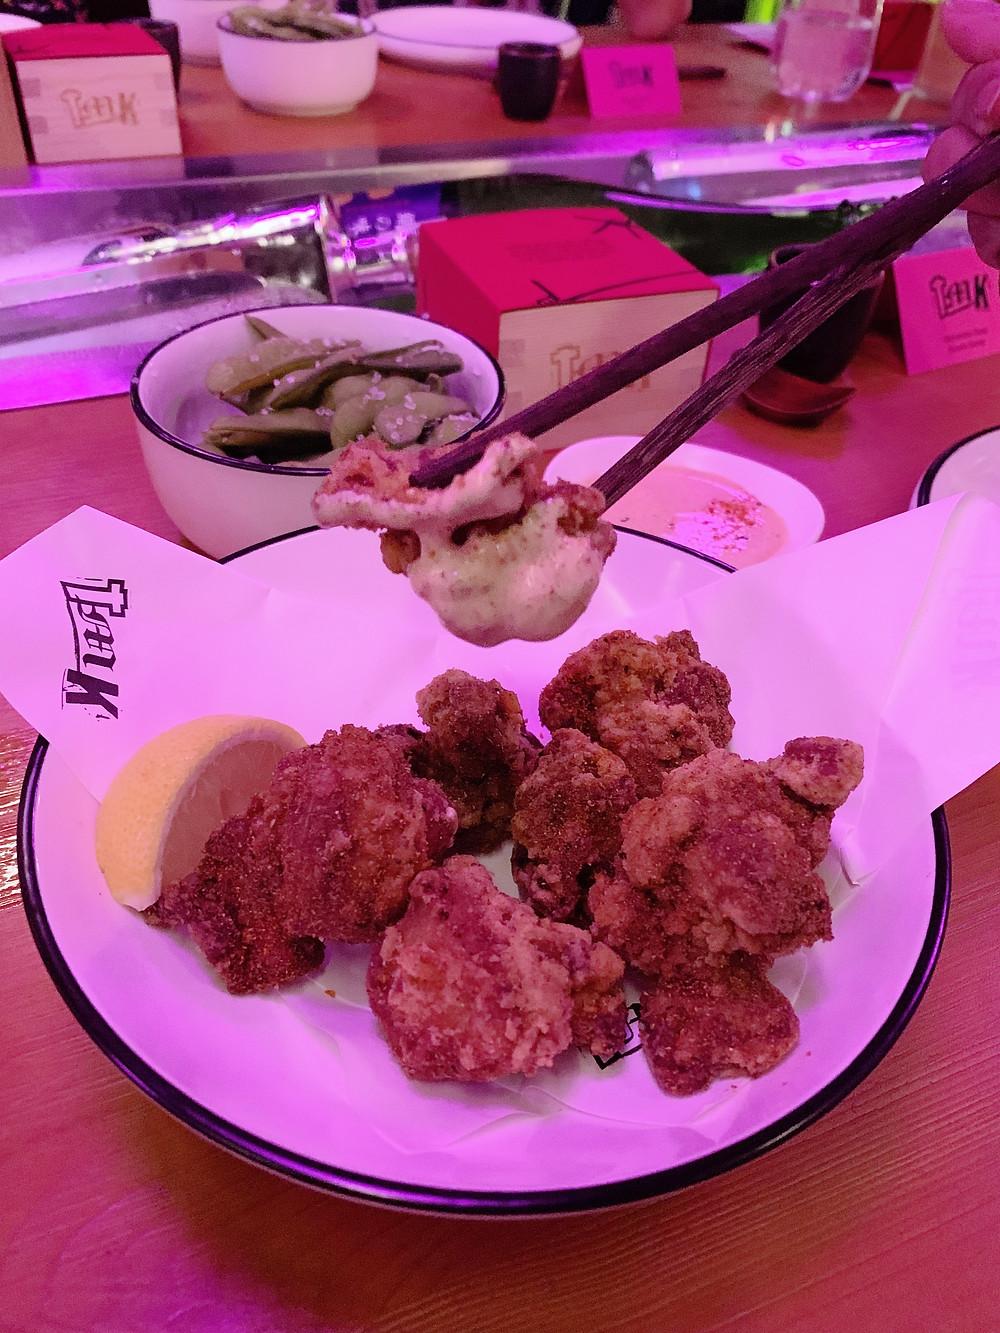 Fried chicken at TMK Japanese sushi restaurant in Hong Kong